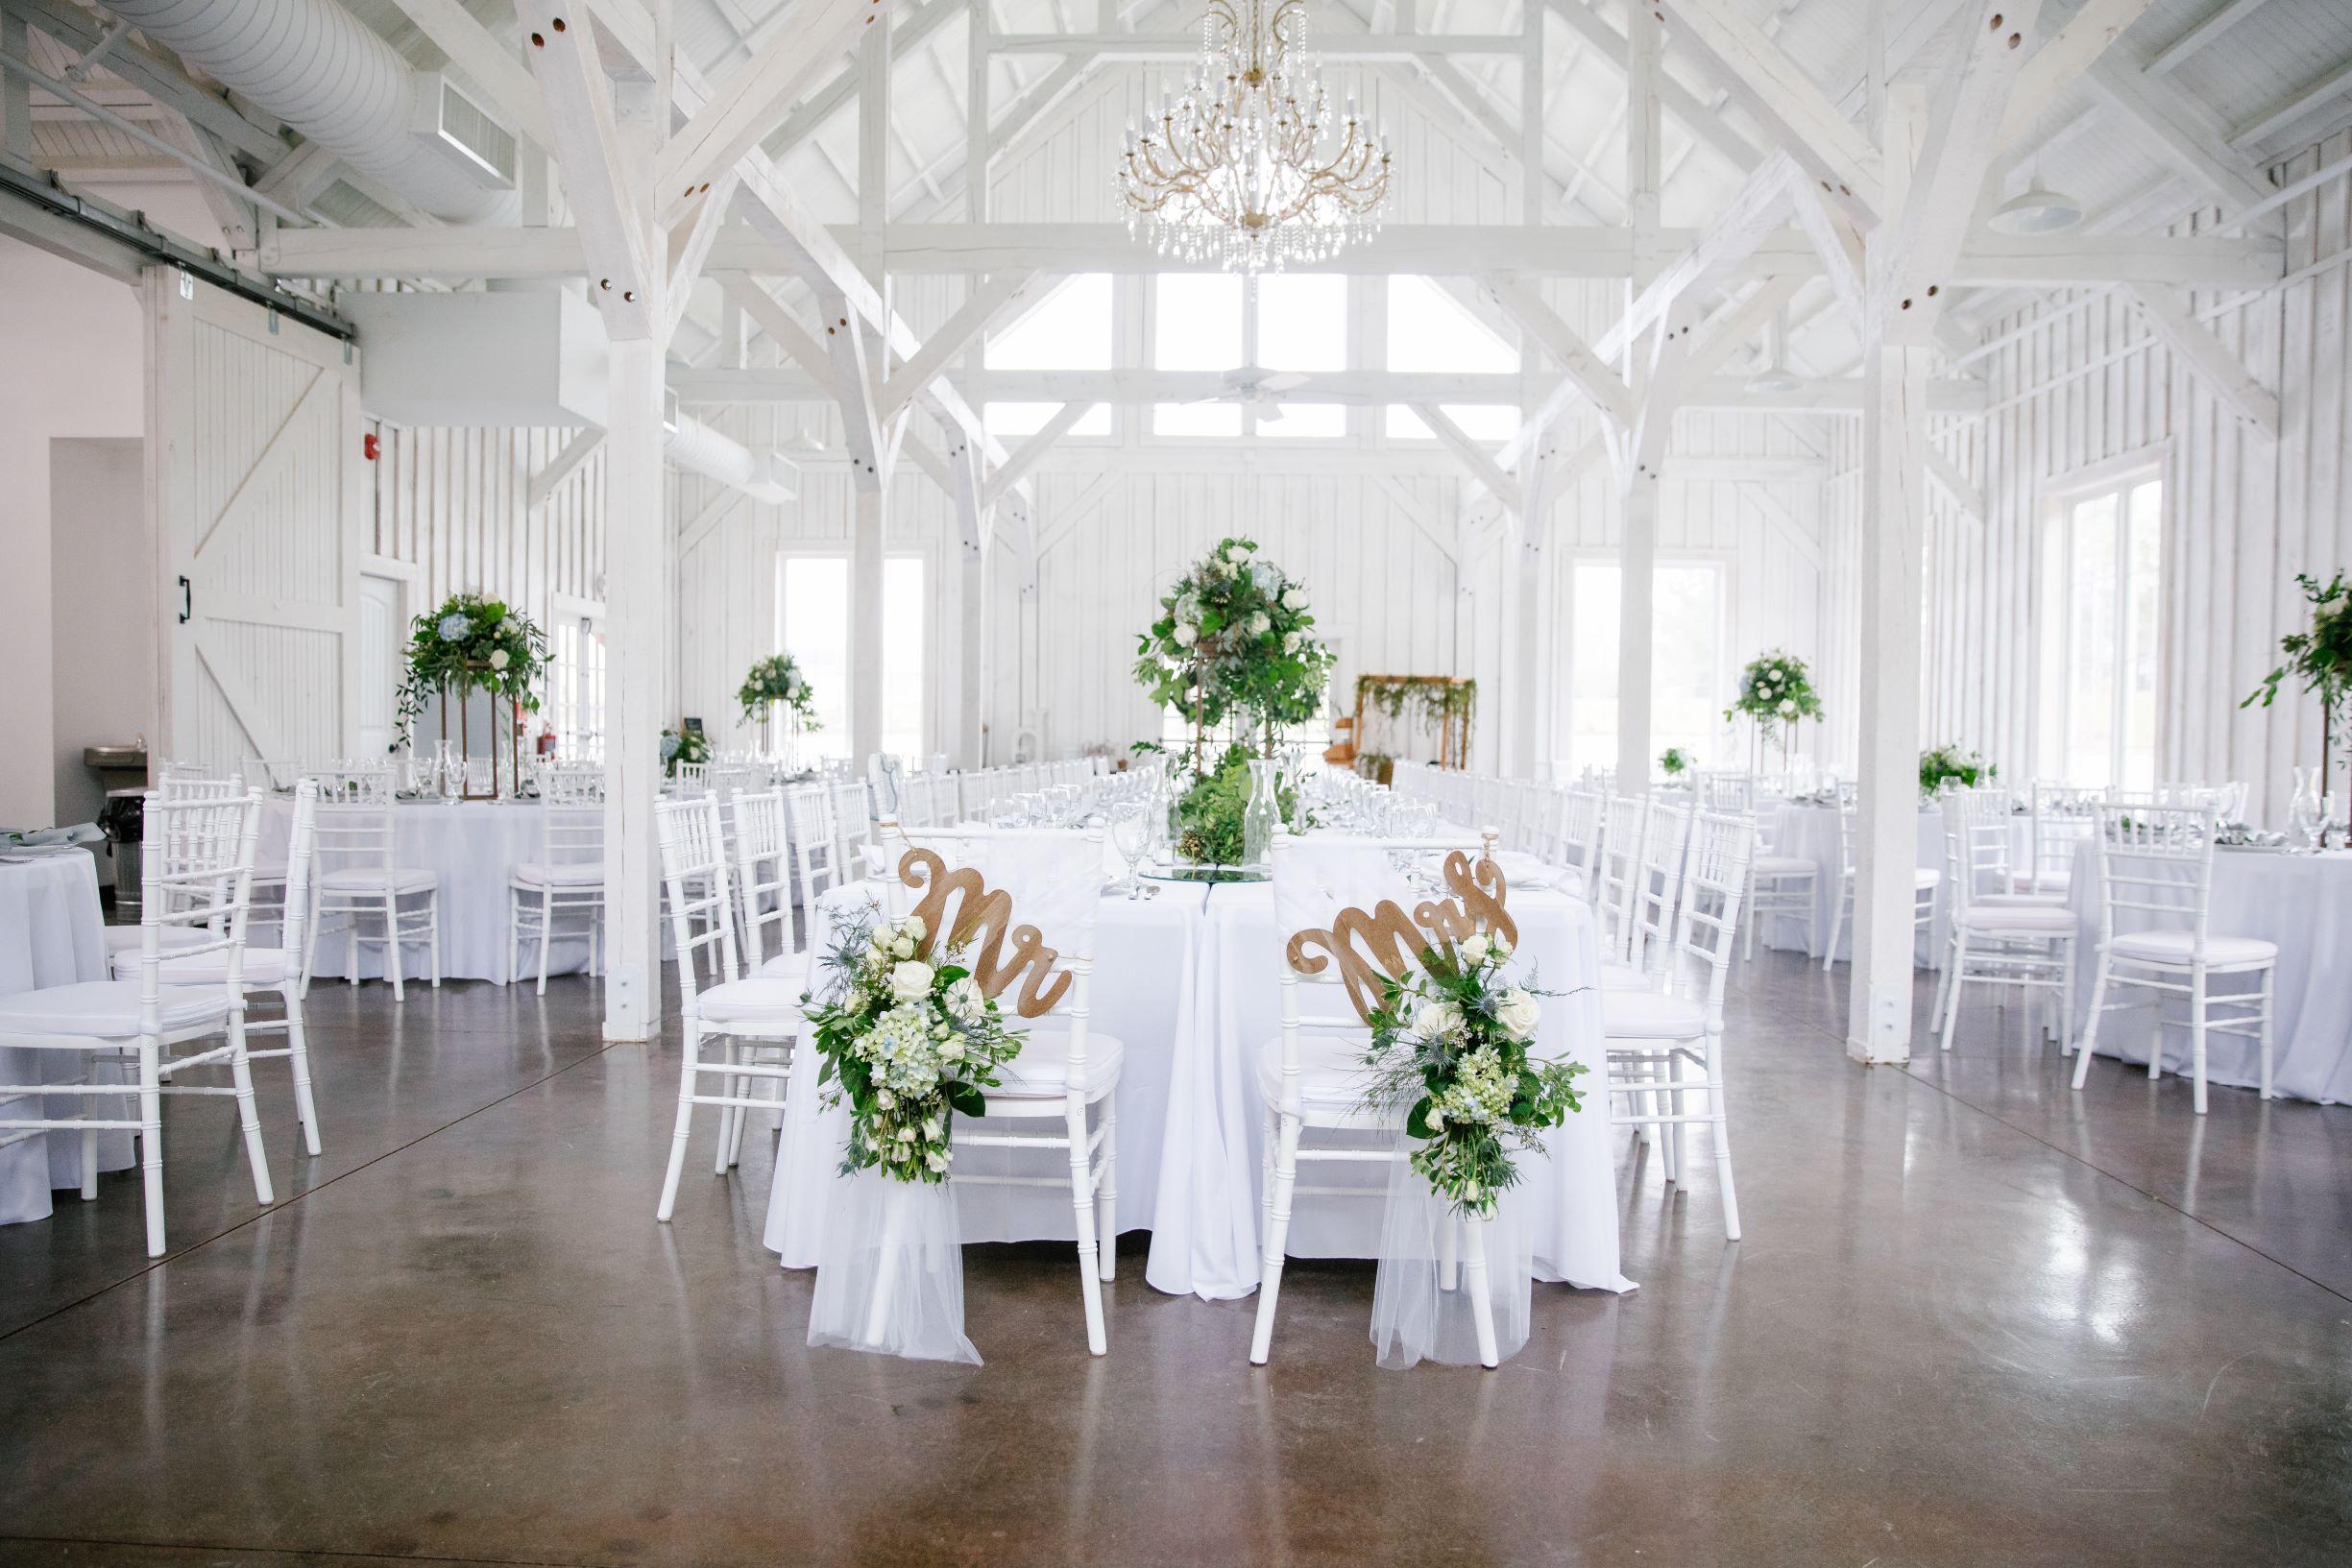 Wedding-Aurora Farms-Taylors-South Carolina-61.jpg